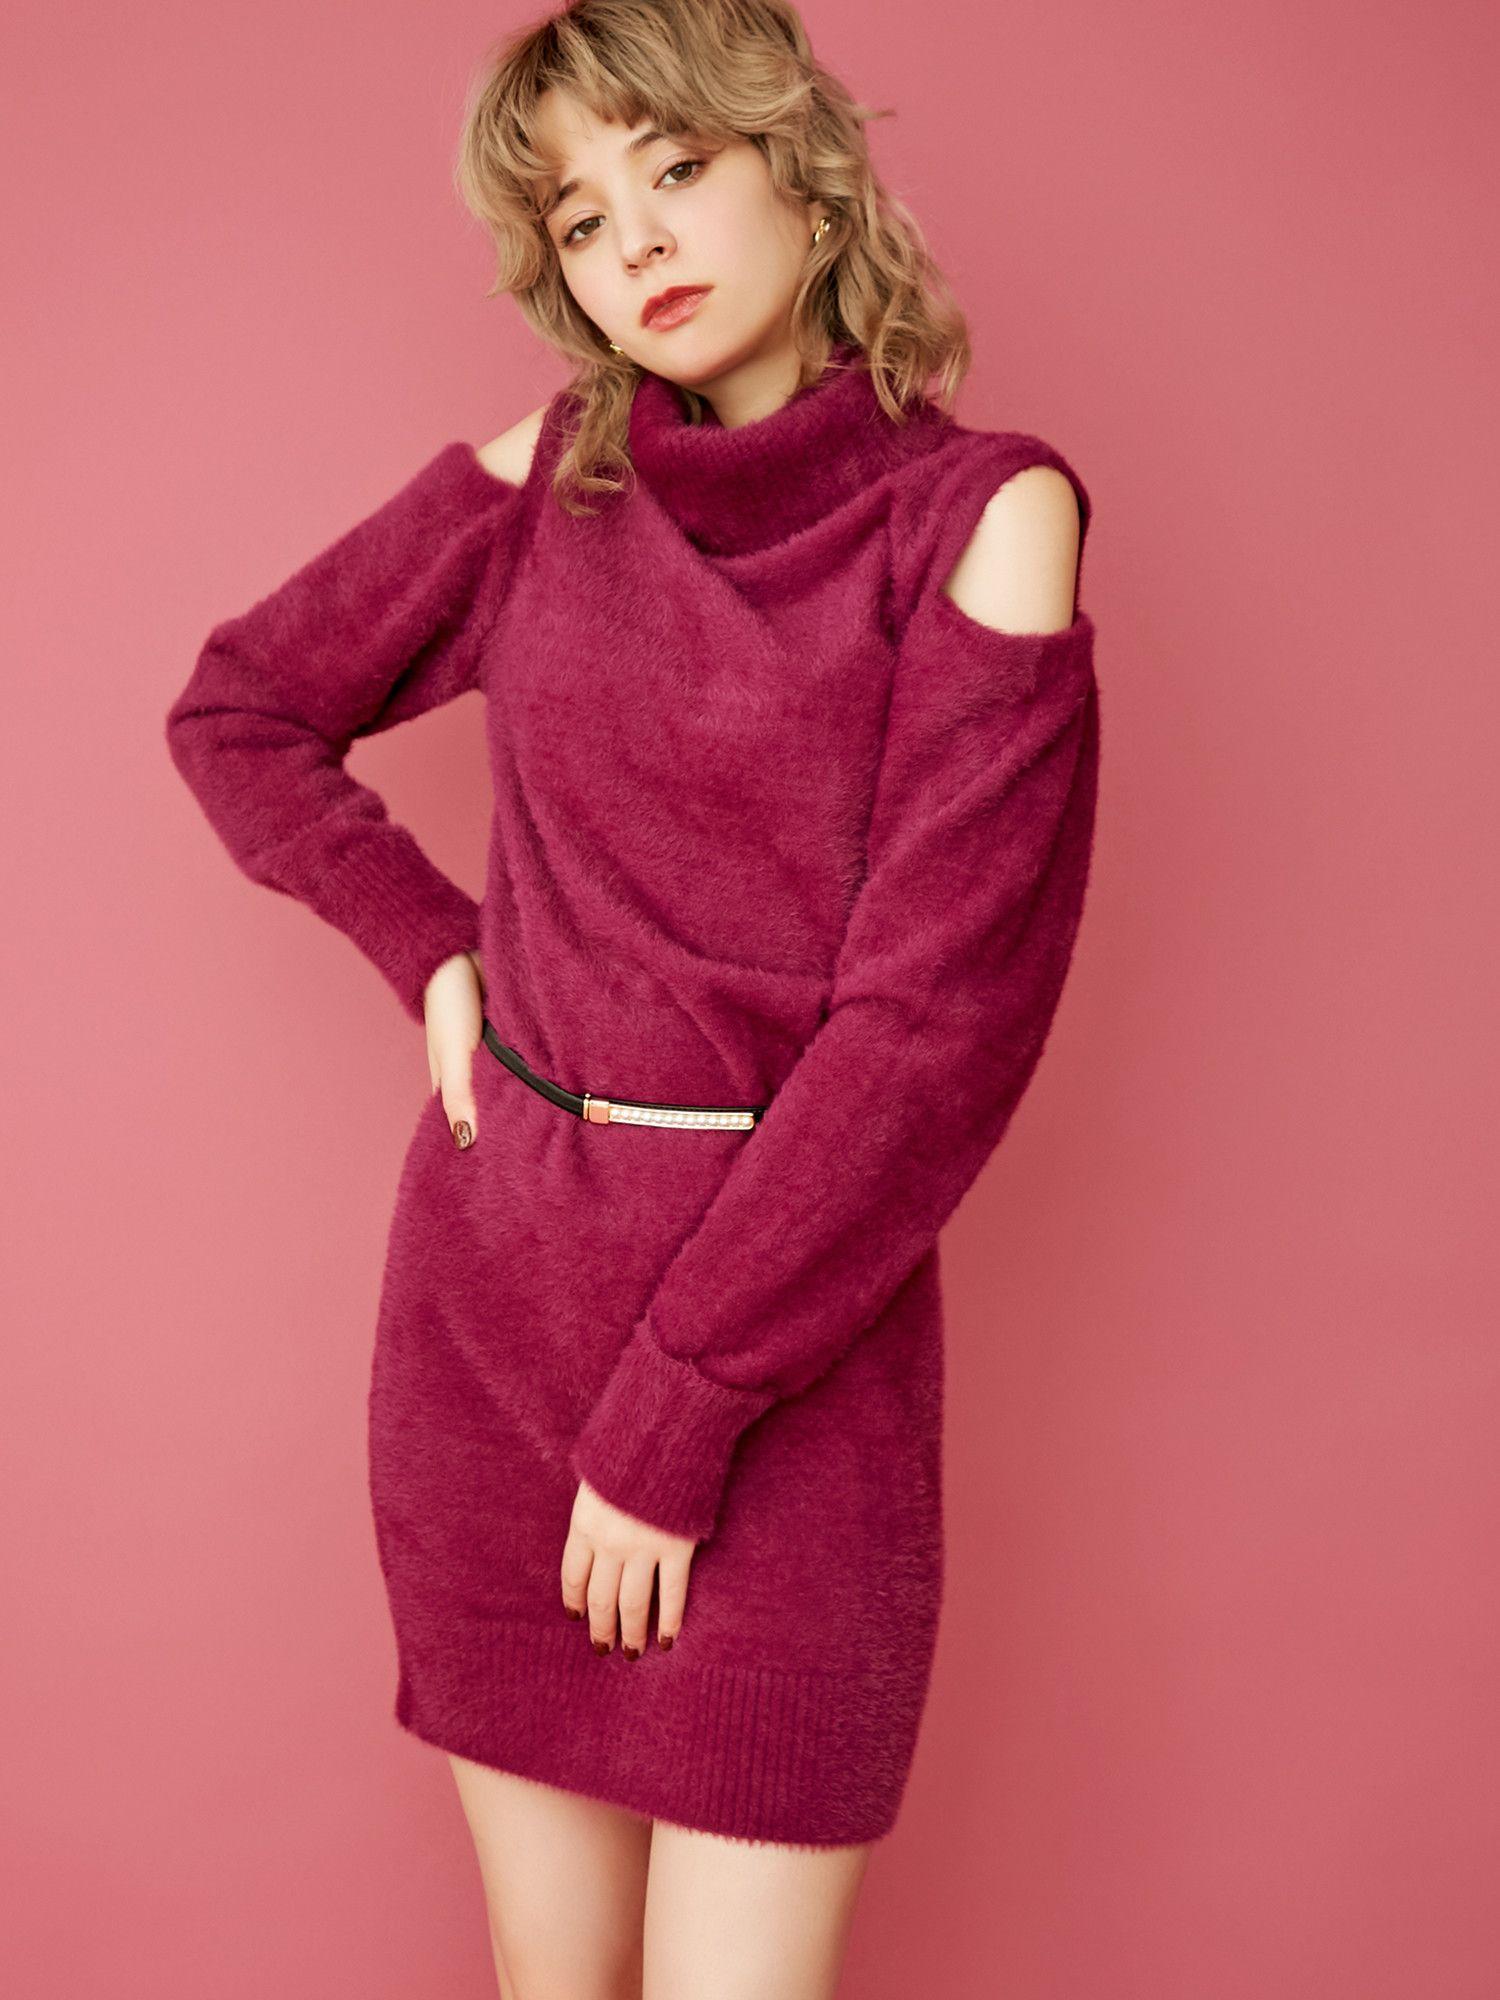 [SW]肩开放针织连衣裙